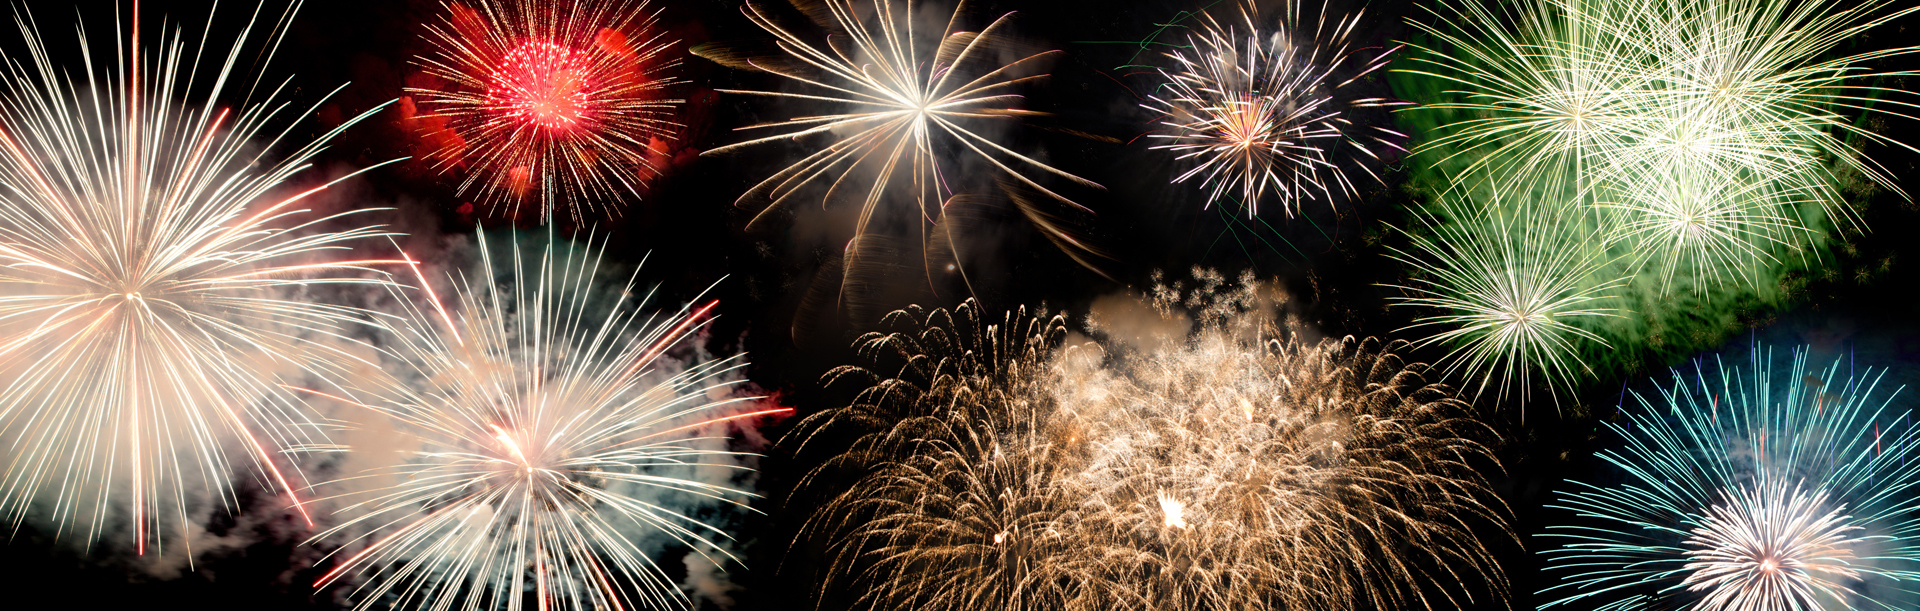 photodune-3494368-fireworks-l1